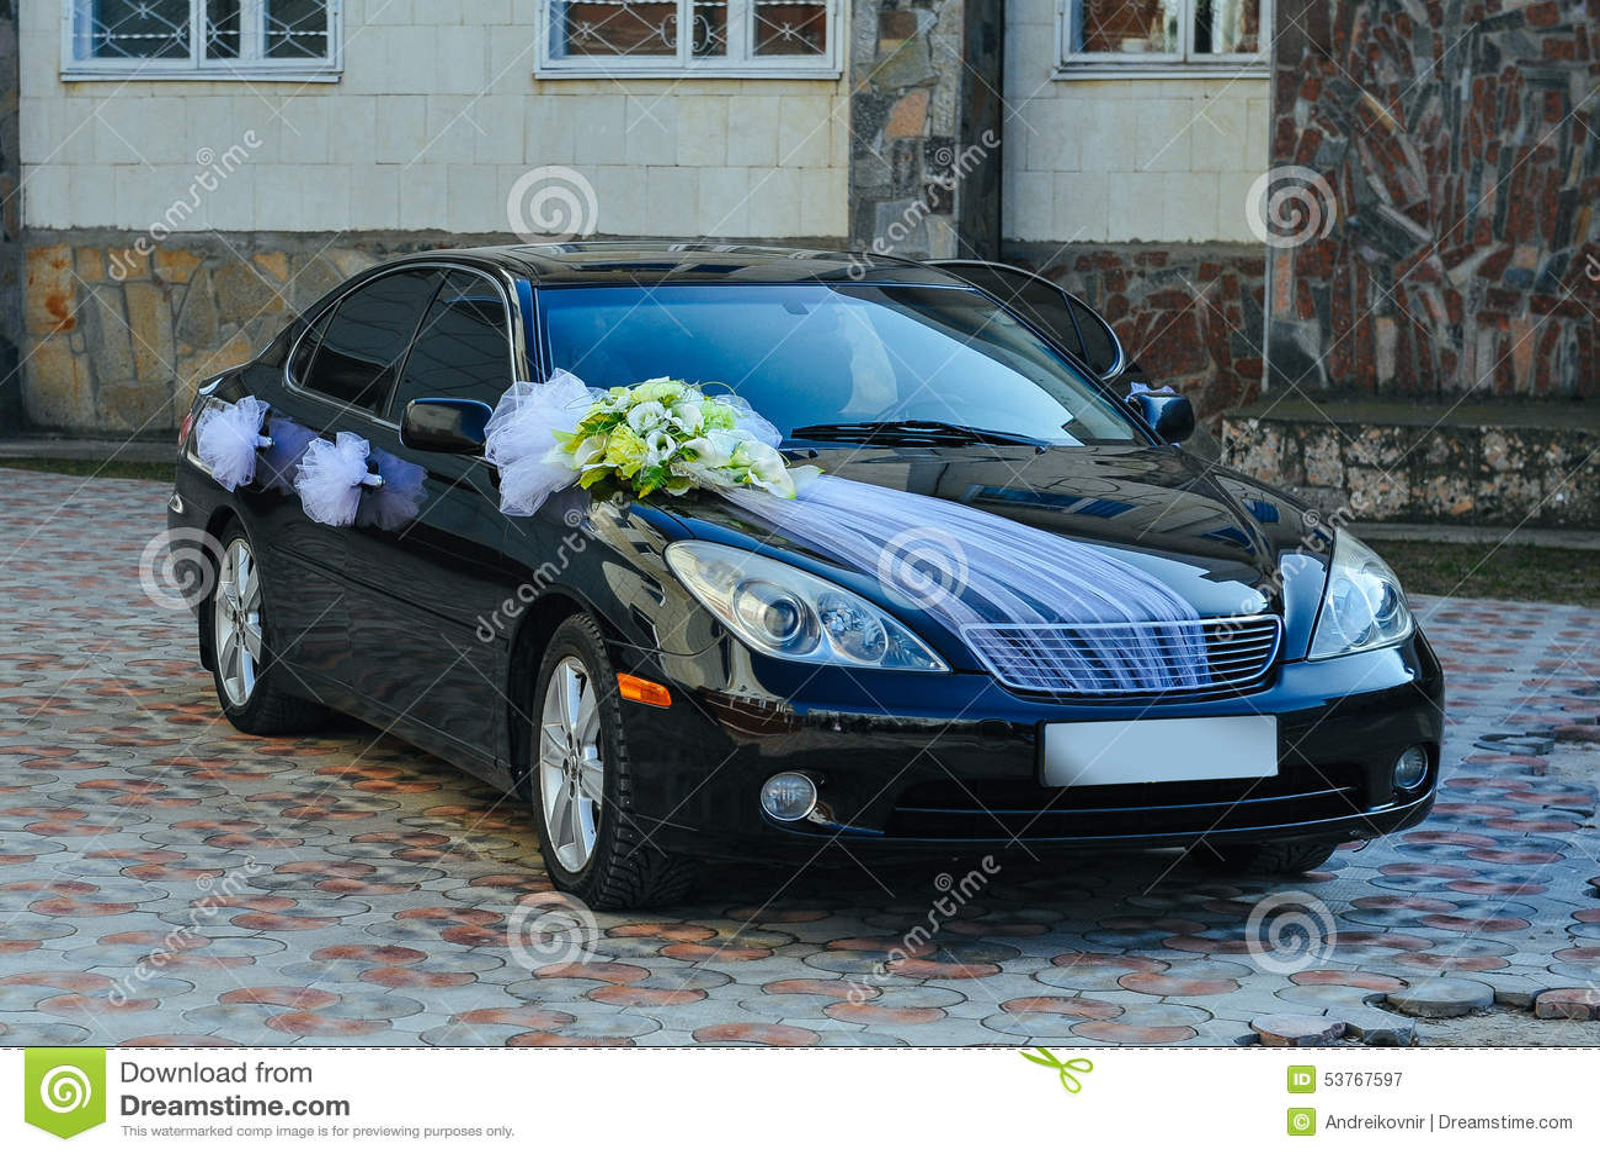 Romantic Decoration Flower On Wedding Car In Black Stock Image